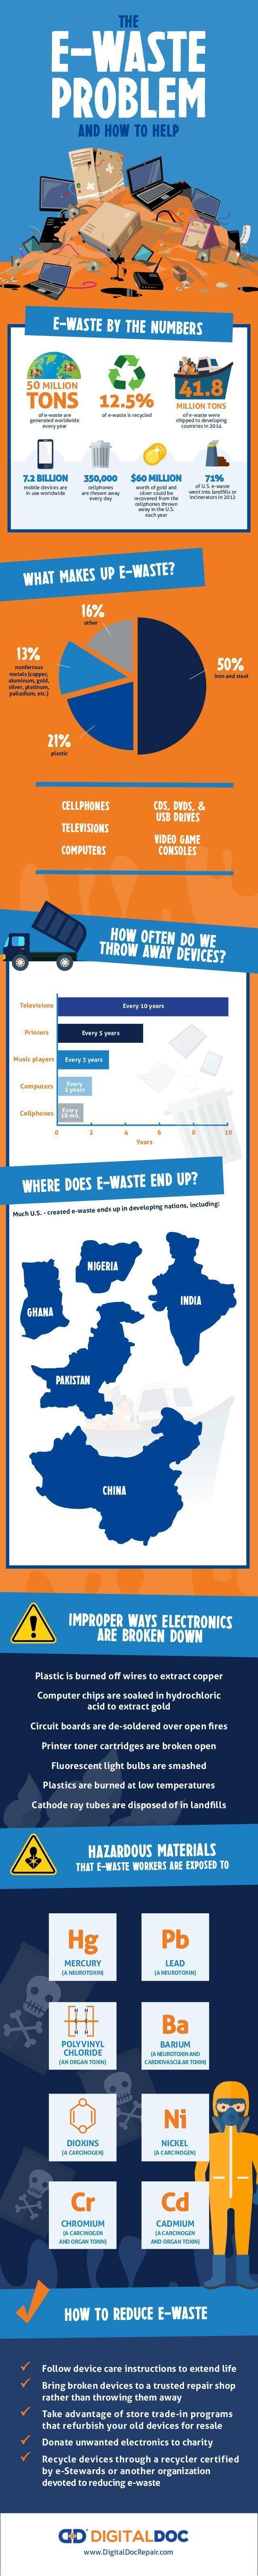 infographic, ewaste, digital doc, green graphics, recycling electronics, electronic waste, electronic disposal #recyclingfacts #recyclinginfographic